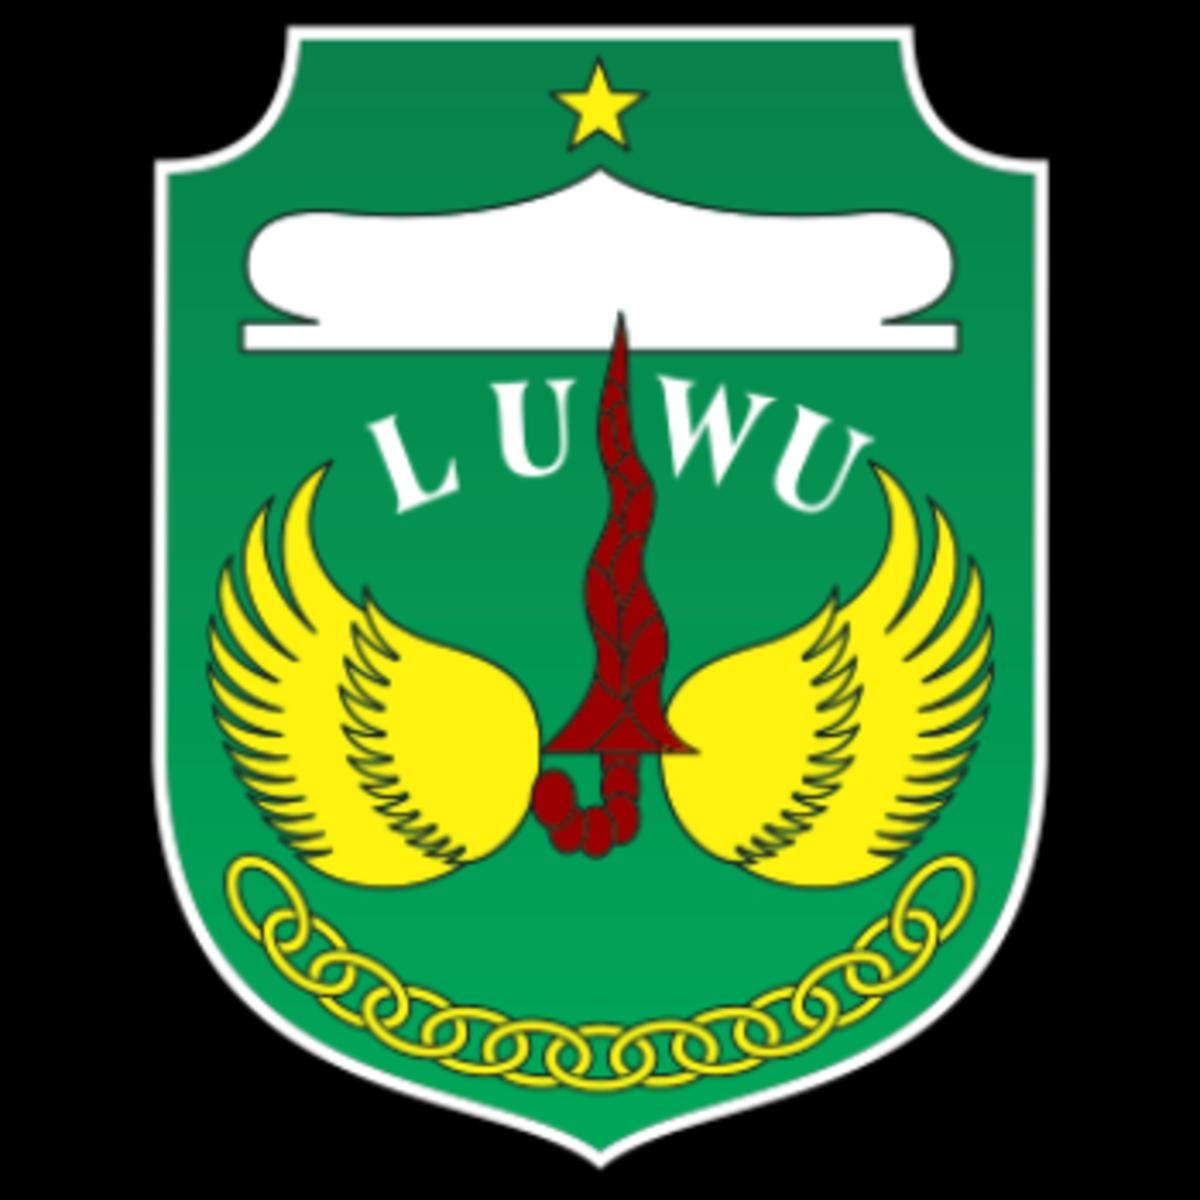 Kabupaten Luwu - Wikipedia bahasa Indonesia, ensiklopedia